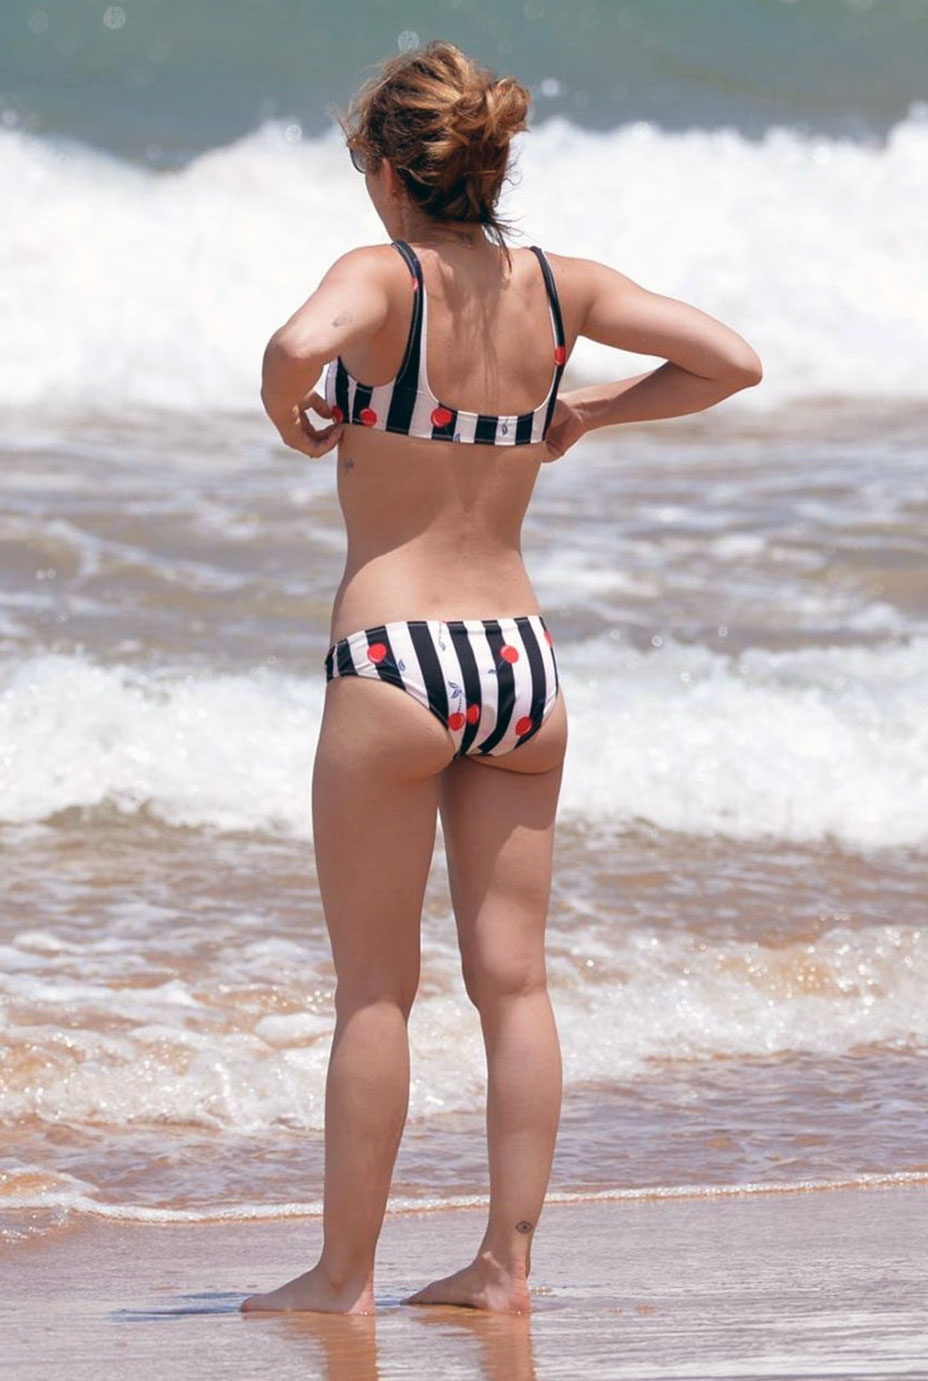 Lucy Hale butt